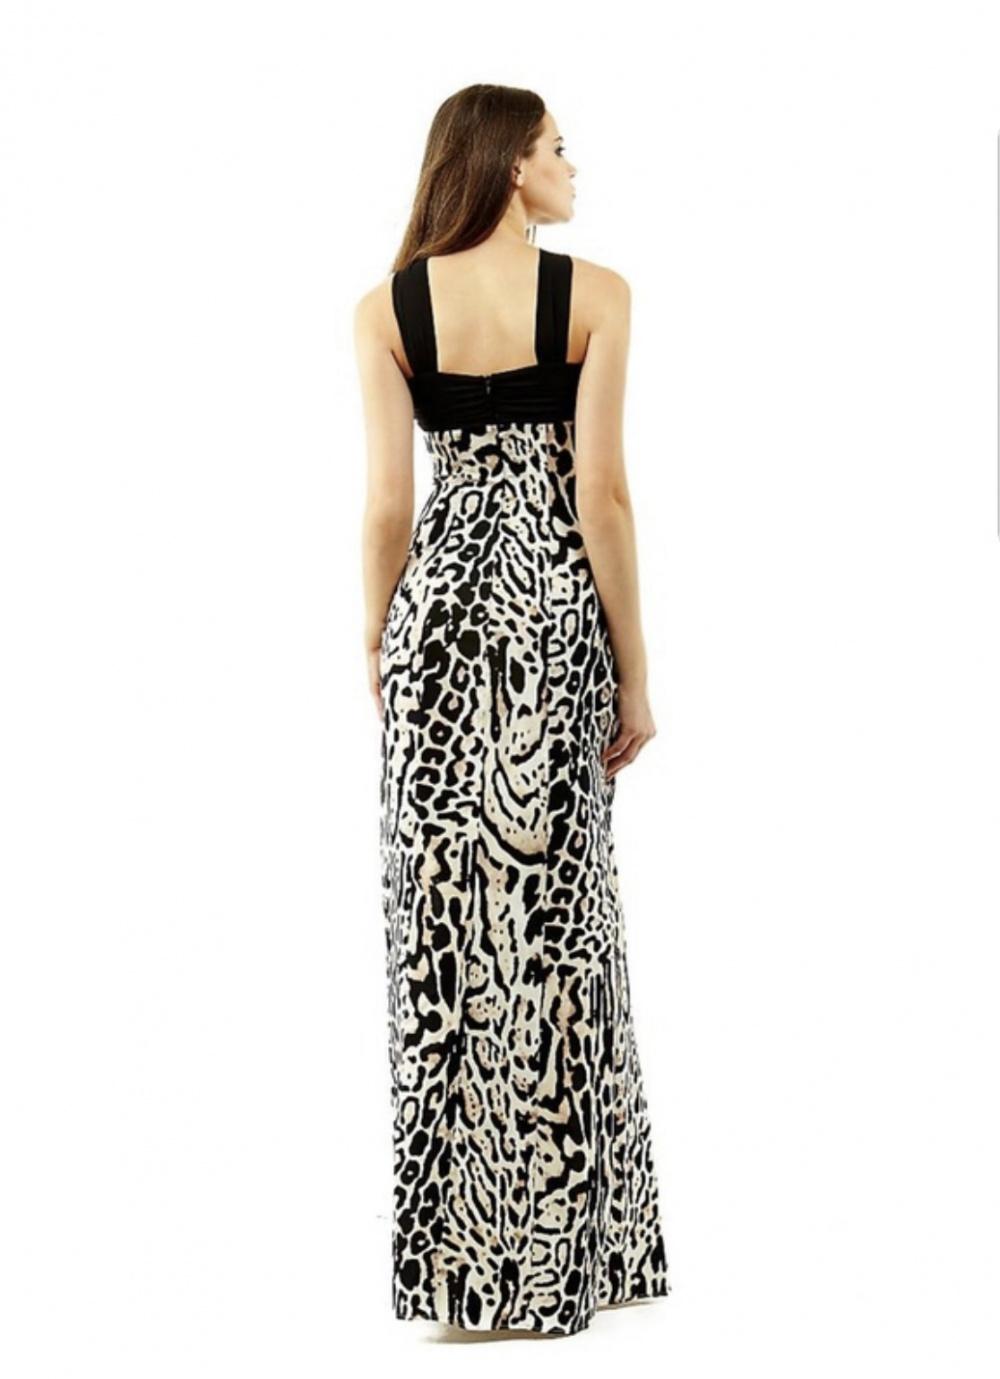 Платье Guess Marciano. Размер 44.